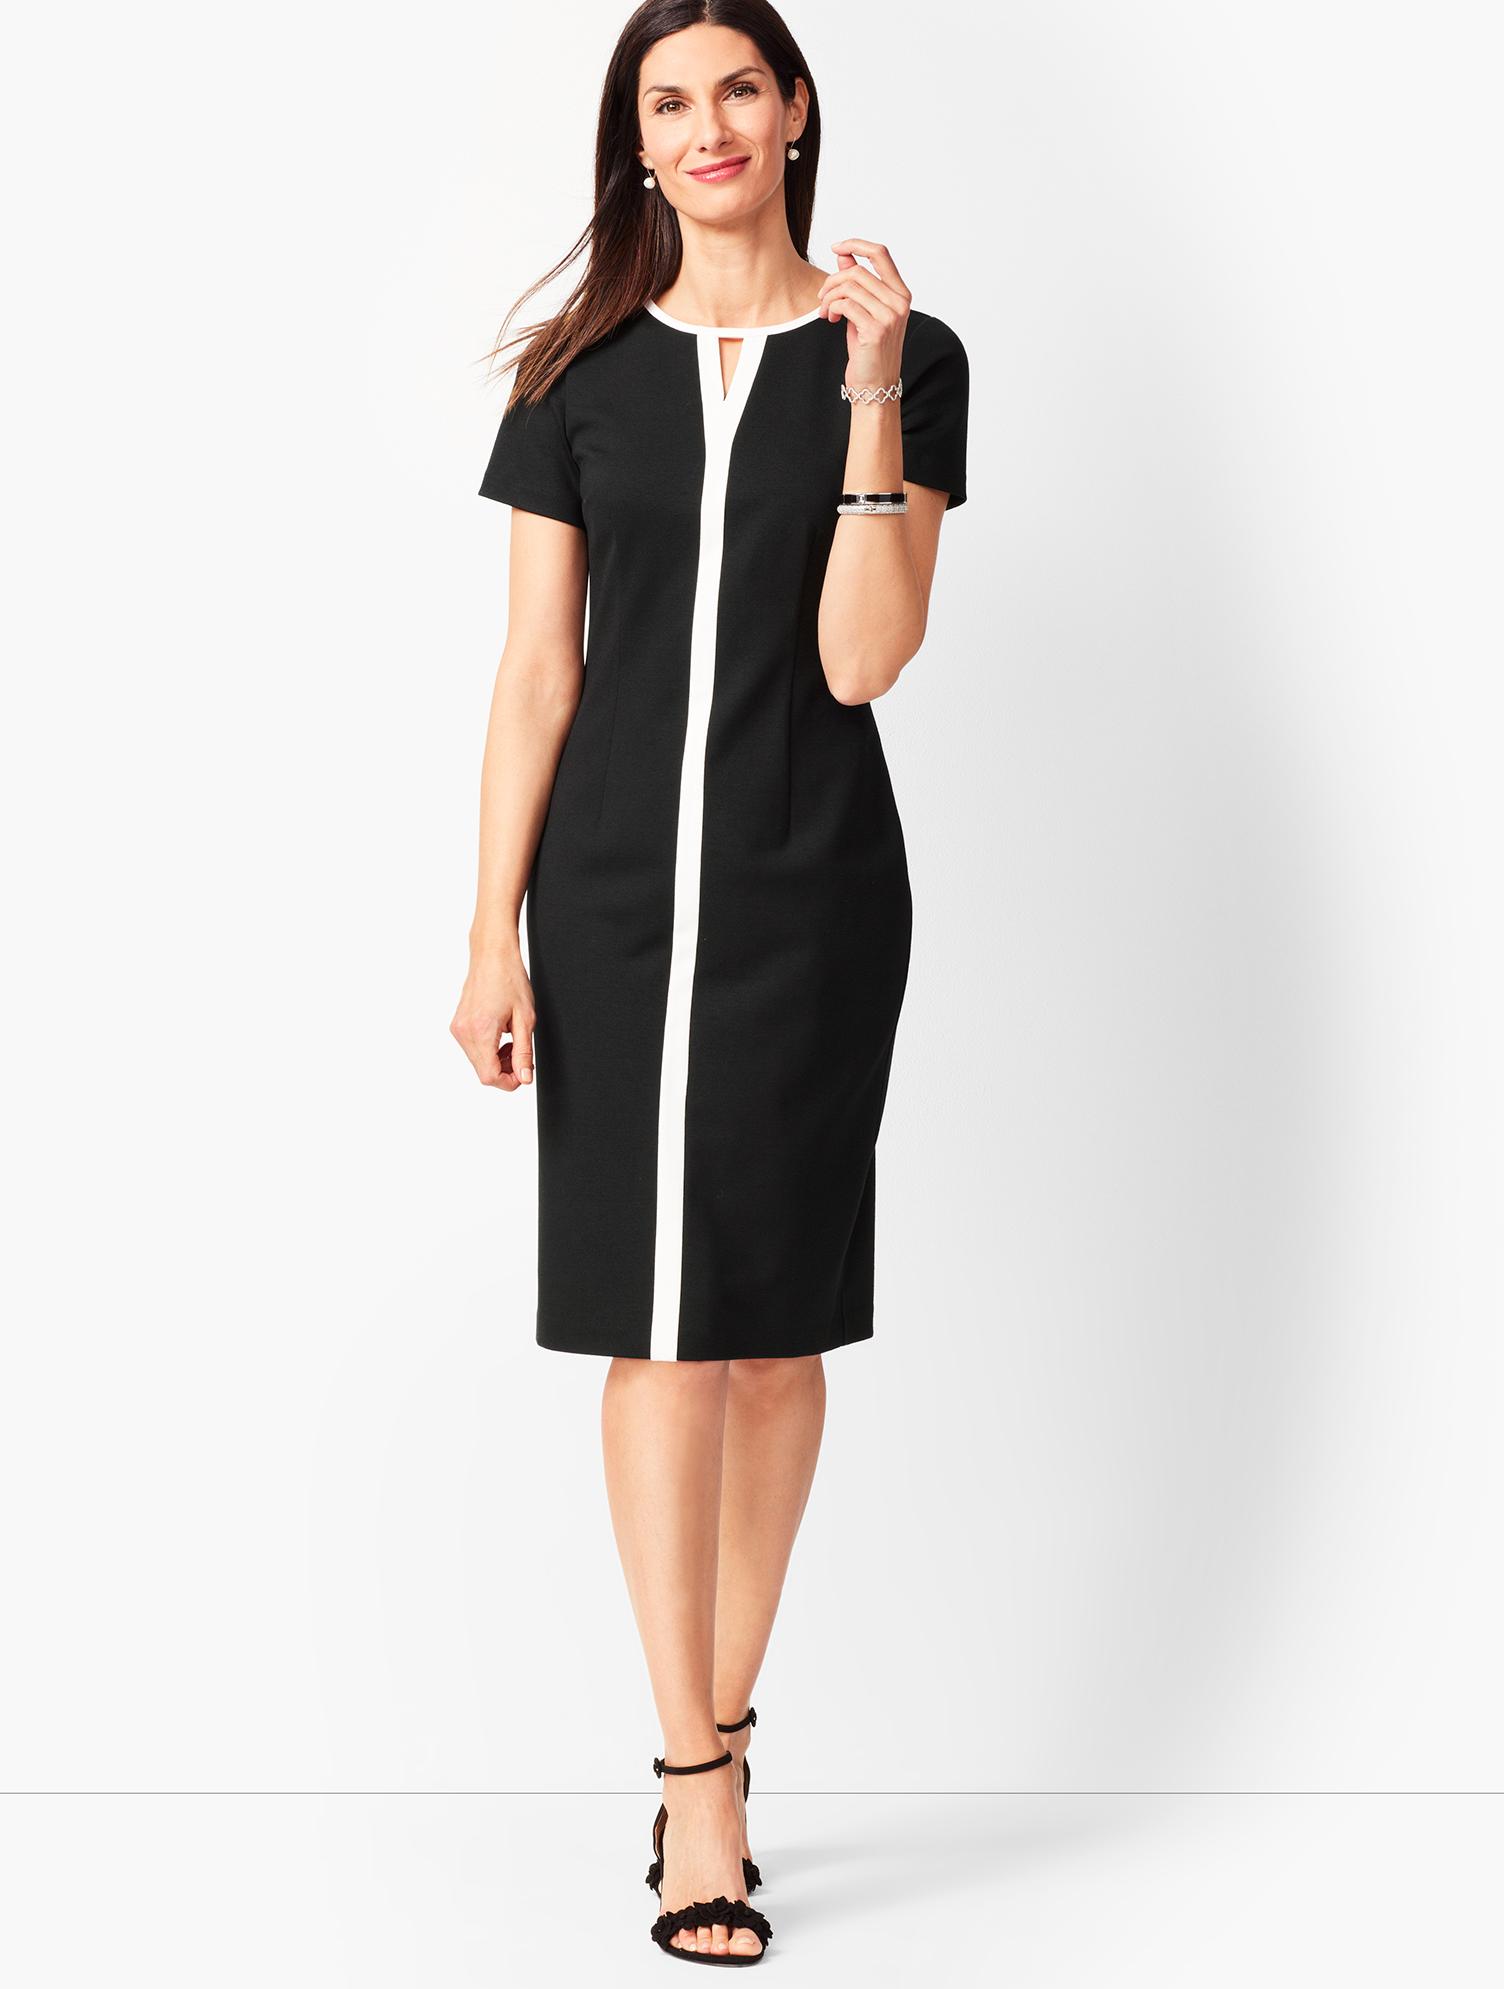 60s 70s Plus Size Dresses, Clothing, Costumes Refined Ponte Sheath Dress - BLACKIVORY - 16 - Talbots $29.39 AT vintagedancer.com